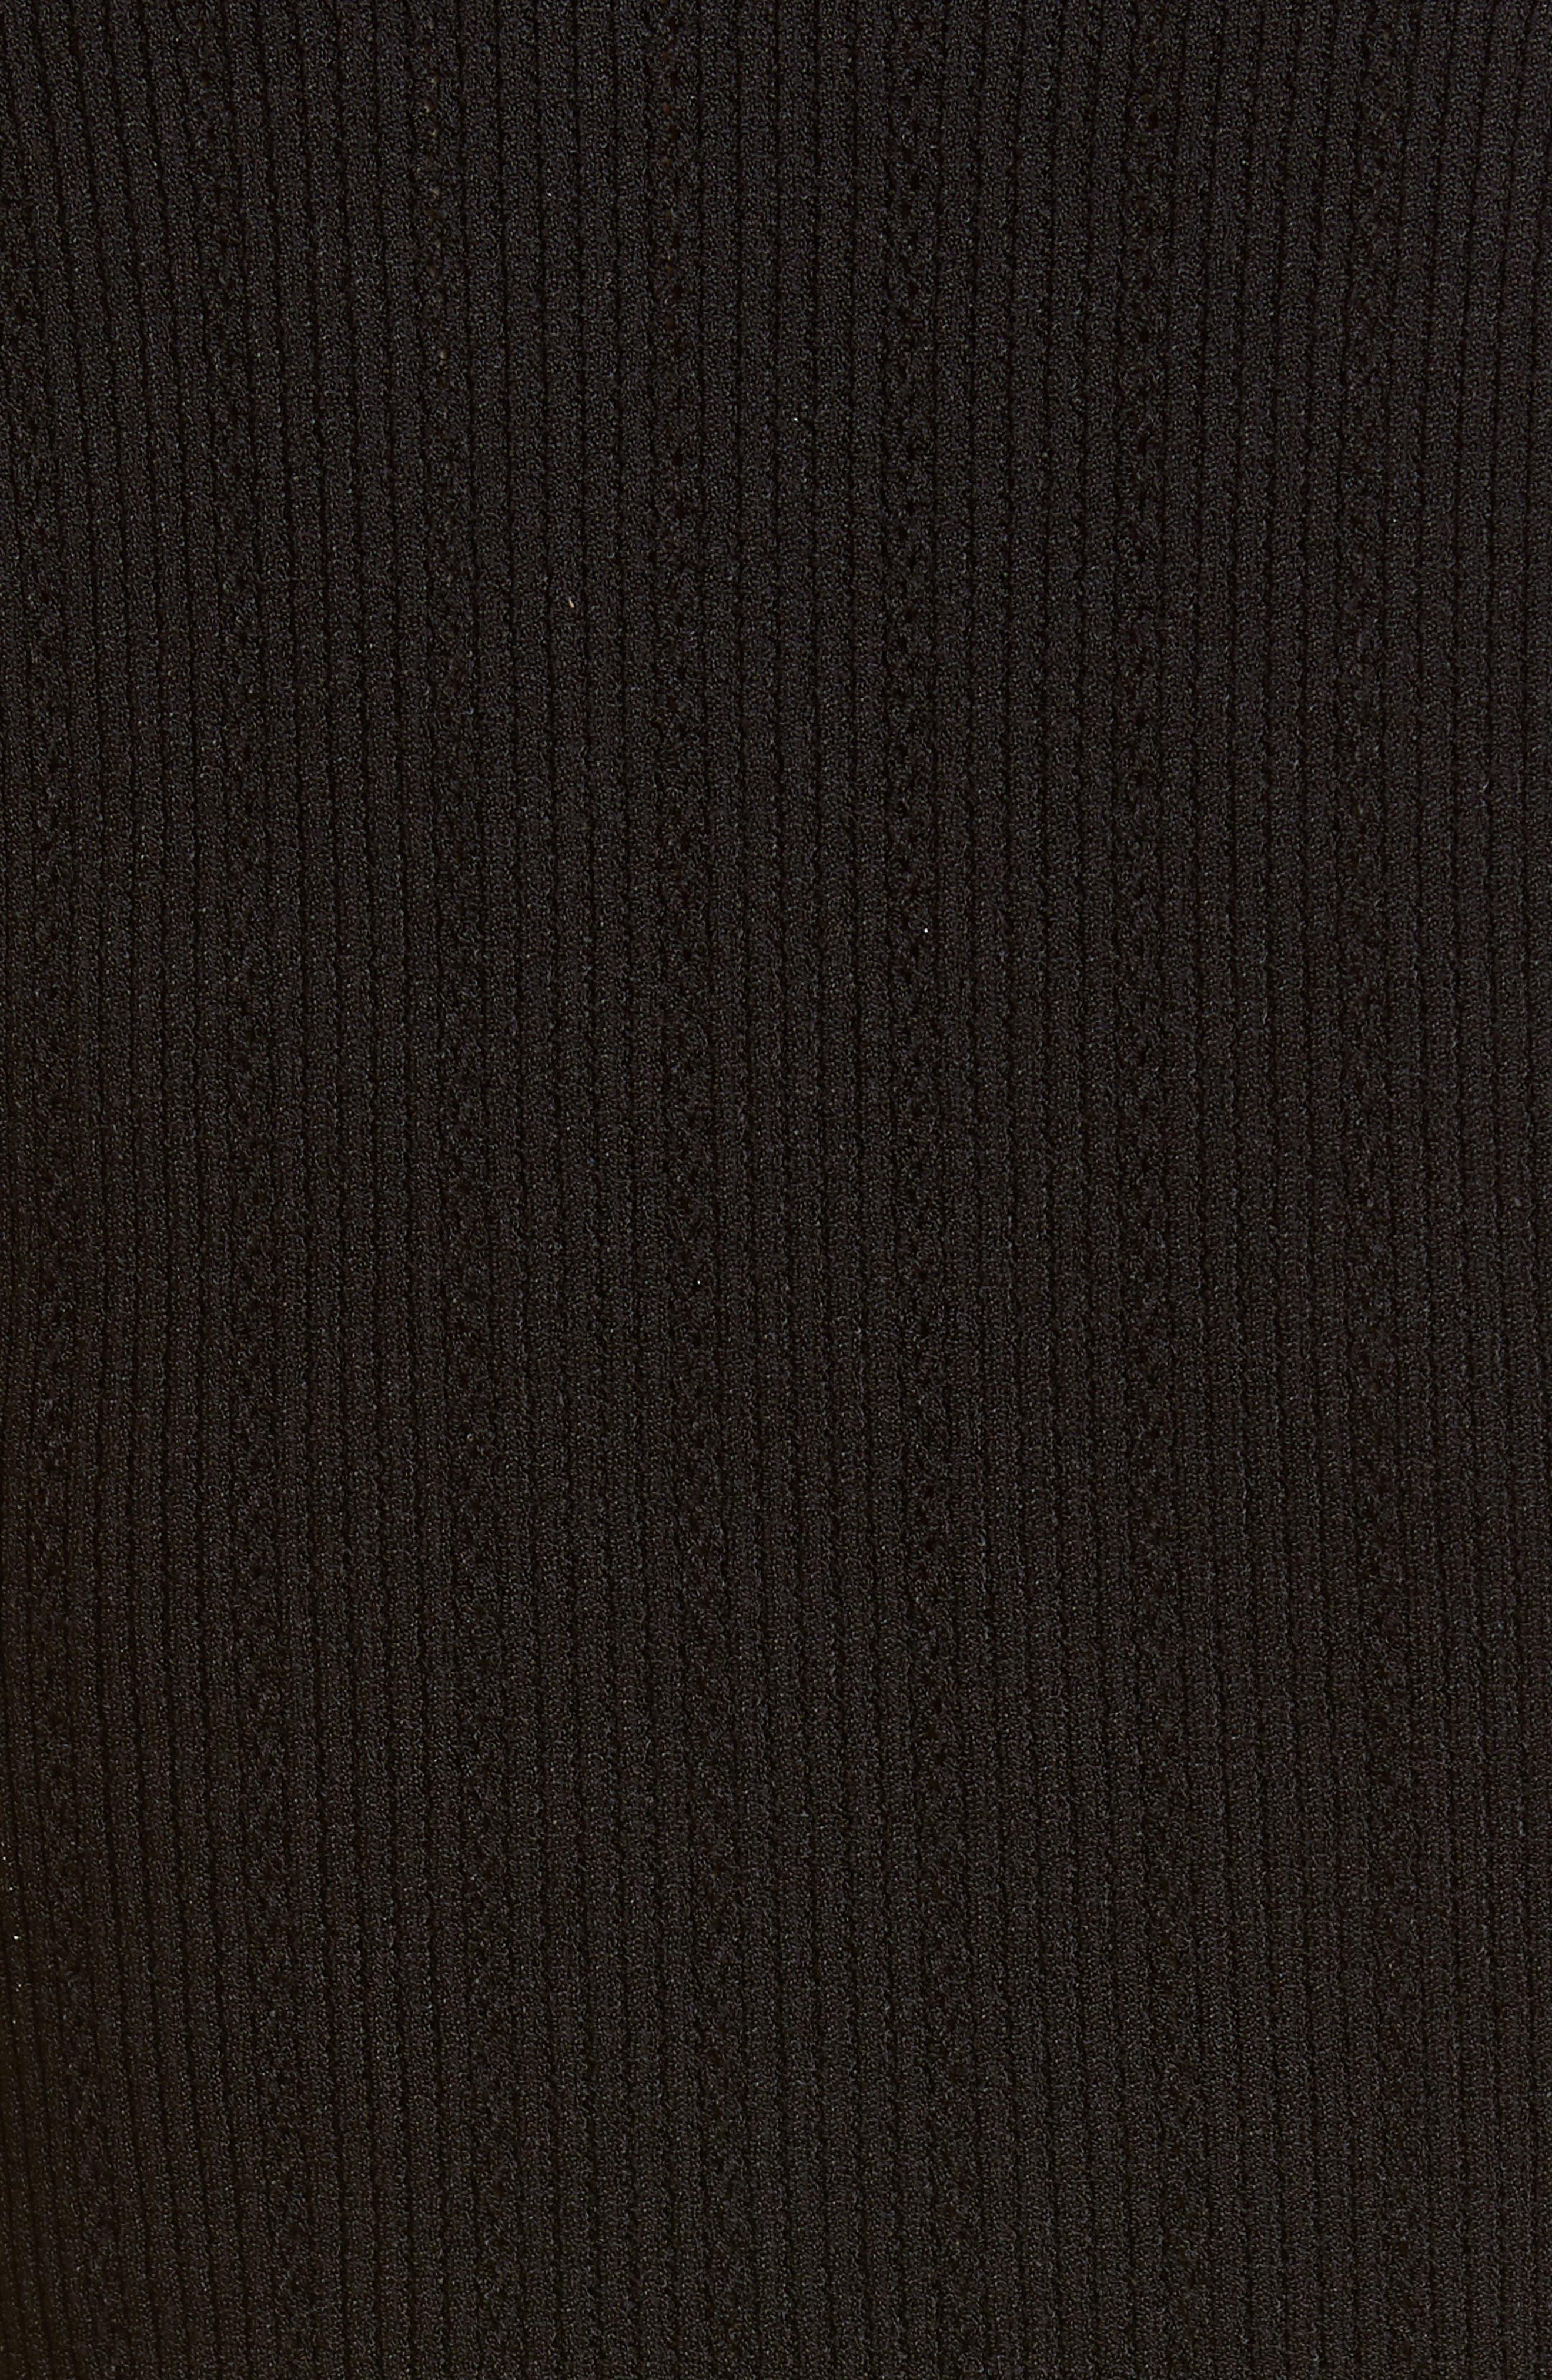 BALMAIN,                             Shoulder Button Rib Knit Top,                             Alternate thumbnail 5, color,                             0PA NOIR